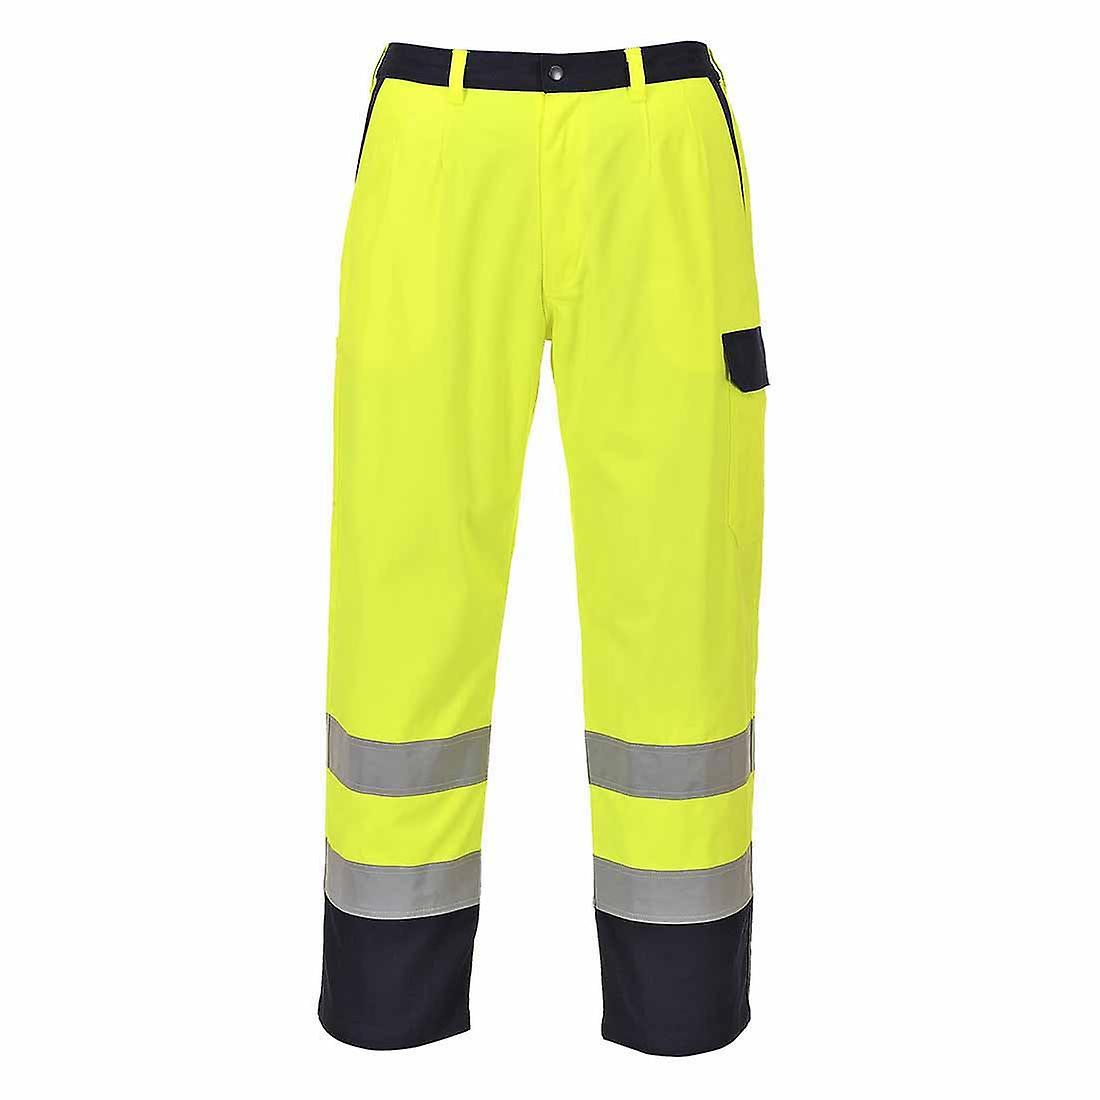 Portwest - Hi-Vis Bizflame Fire Resistant Workwear Trousers